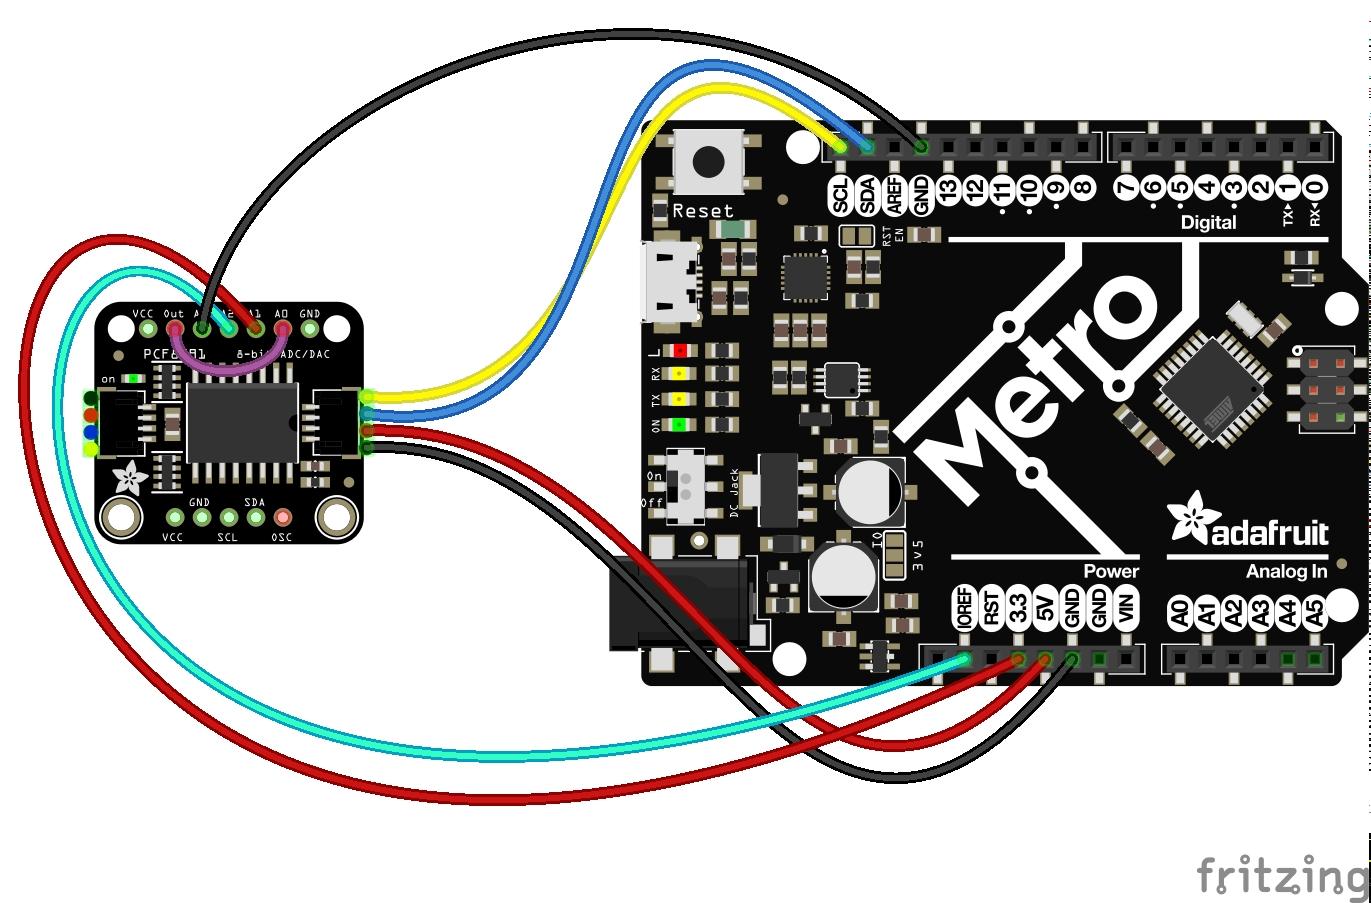 adafruit_products_PCF8591_Arduino_I2C_STEMMA_bb.jpg